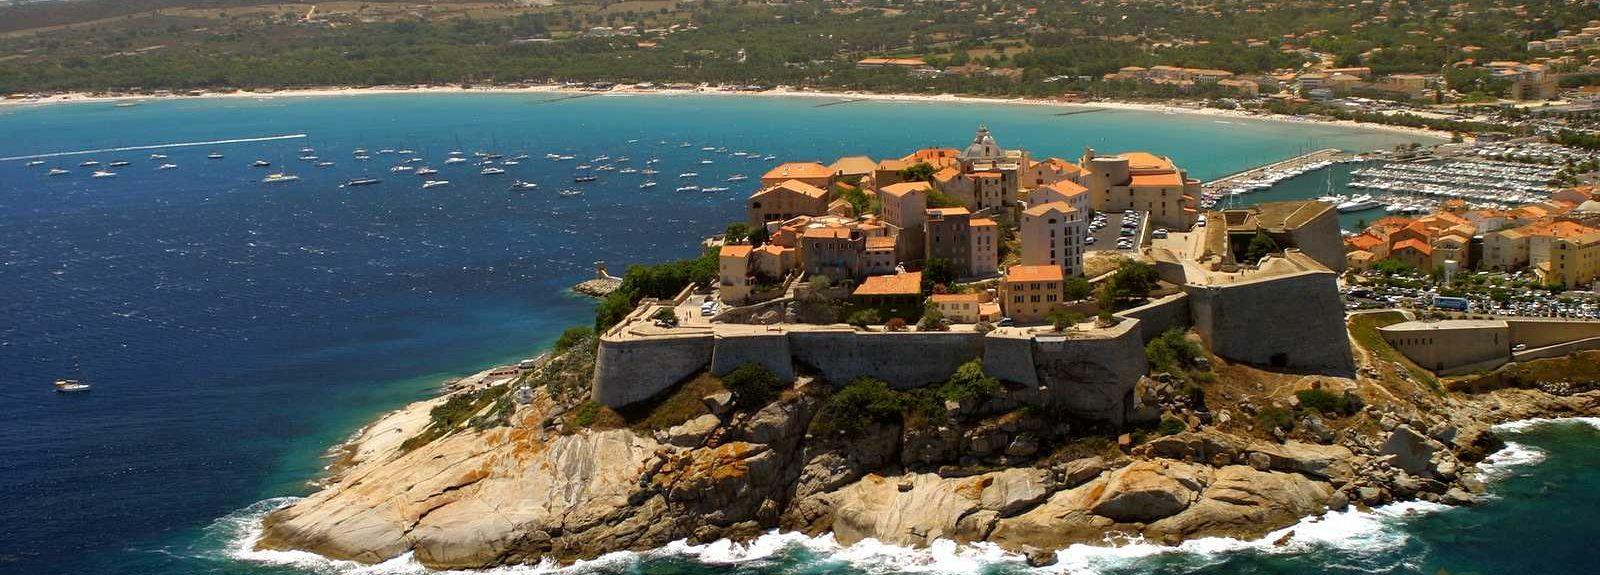 Marine de Saint-Ambroggio, Lumio, Corsica, Francia